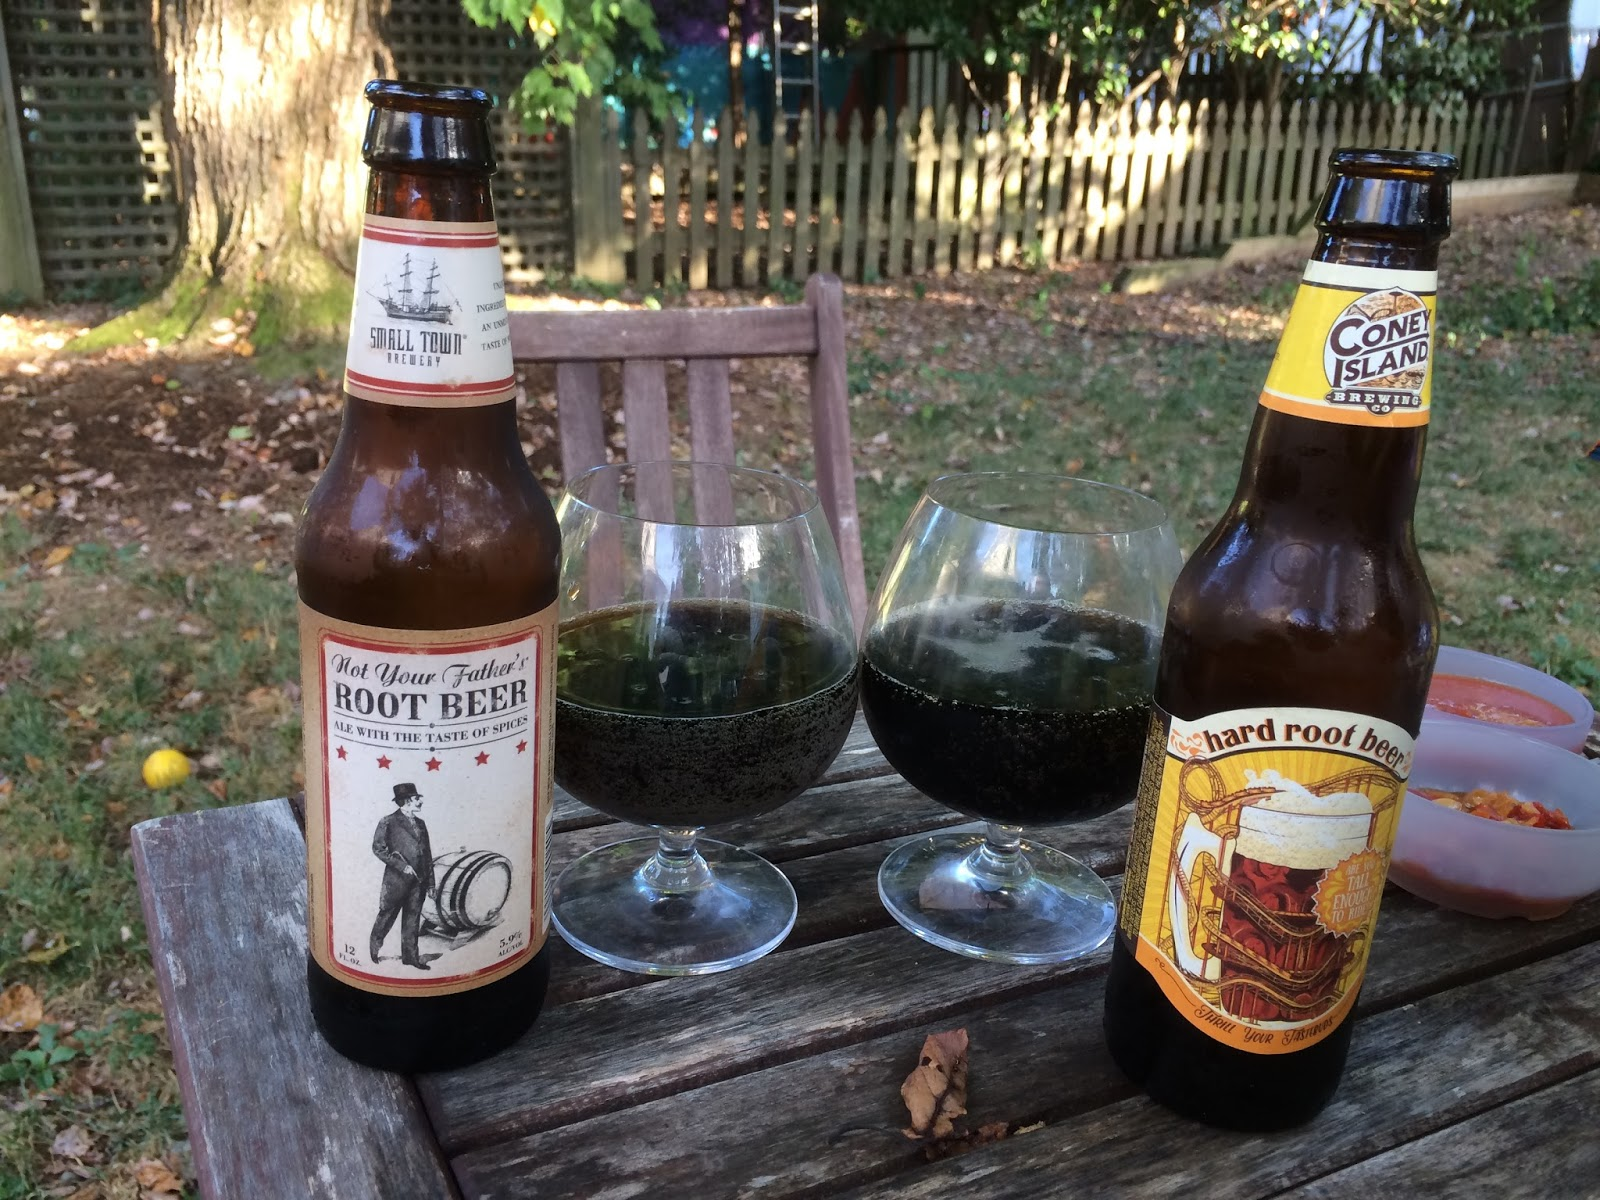 coney island hard root beer vs not your father u0027s root beer in